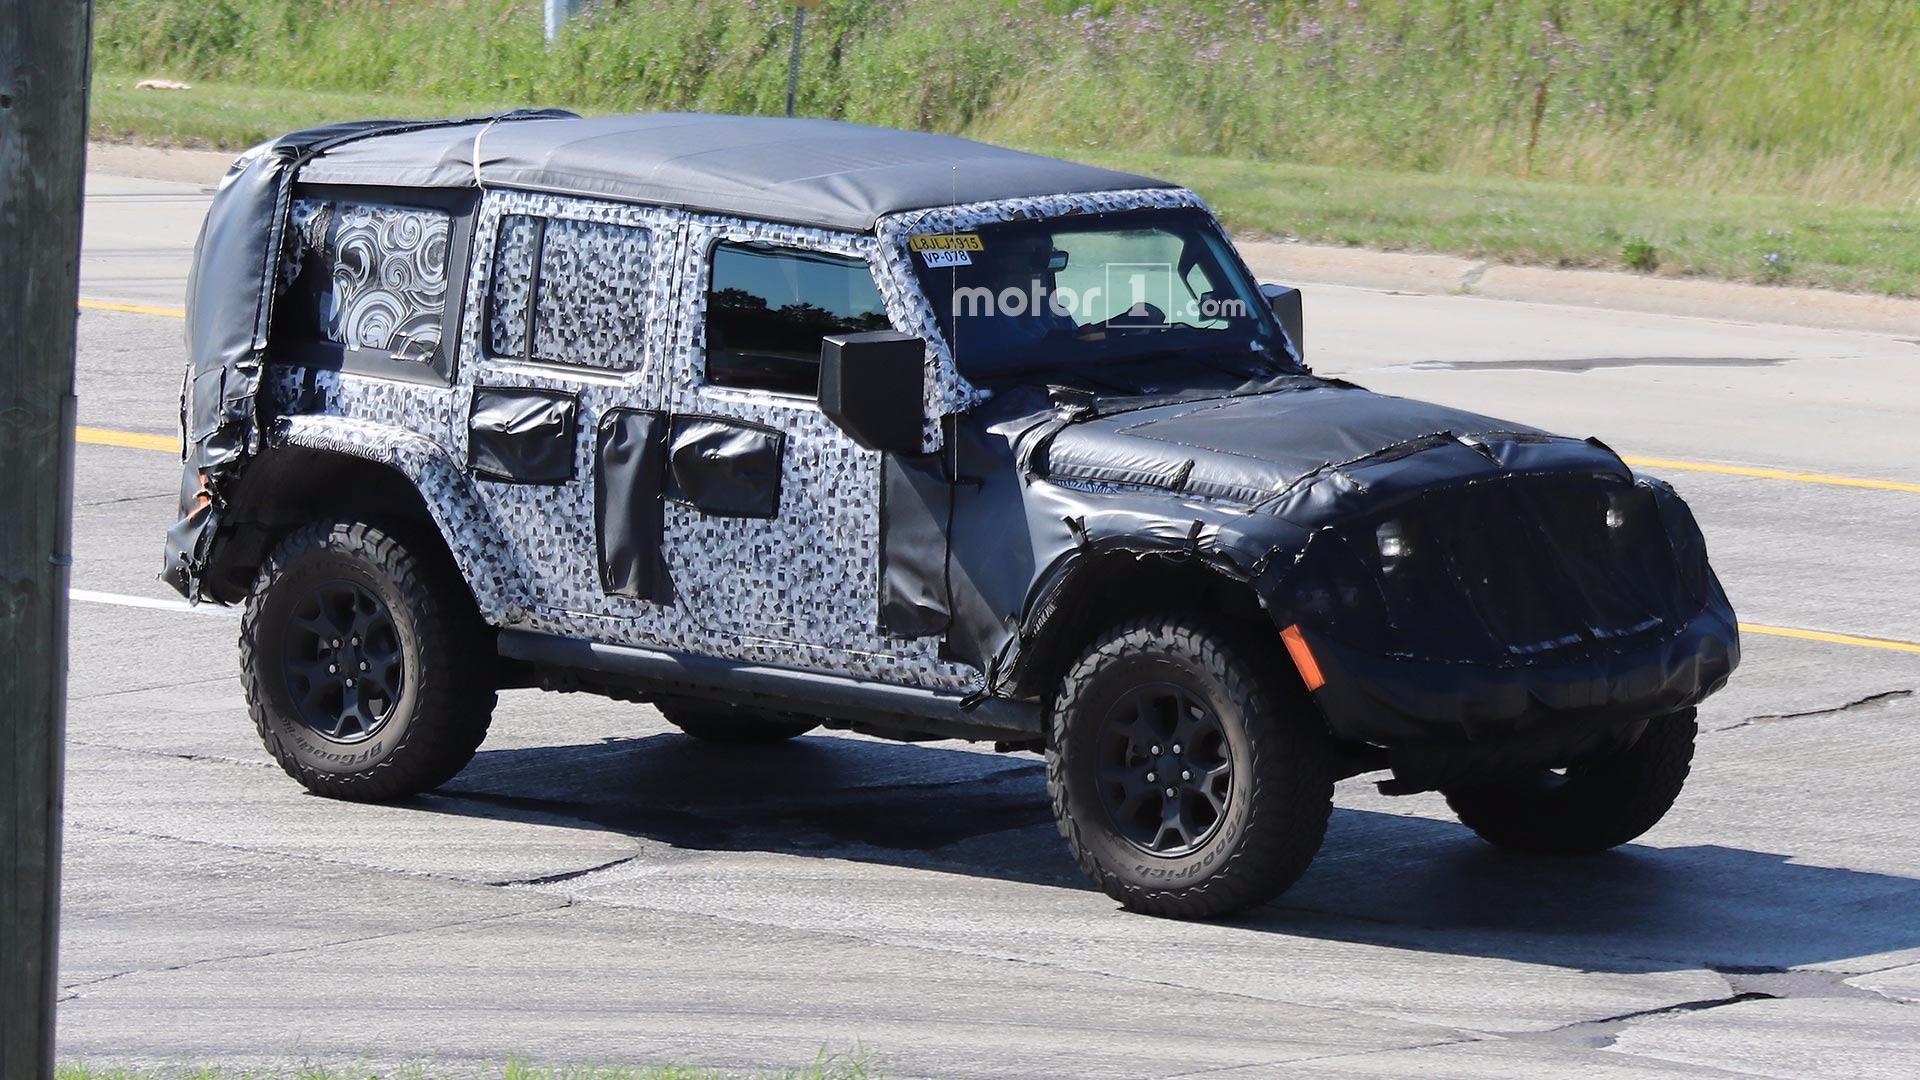 2018 Jeep Wrangler Jl Info Leaks From Dealer Order System Leak Jk